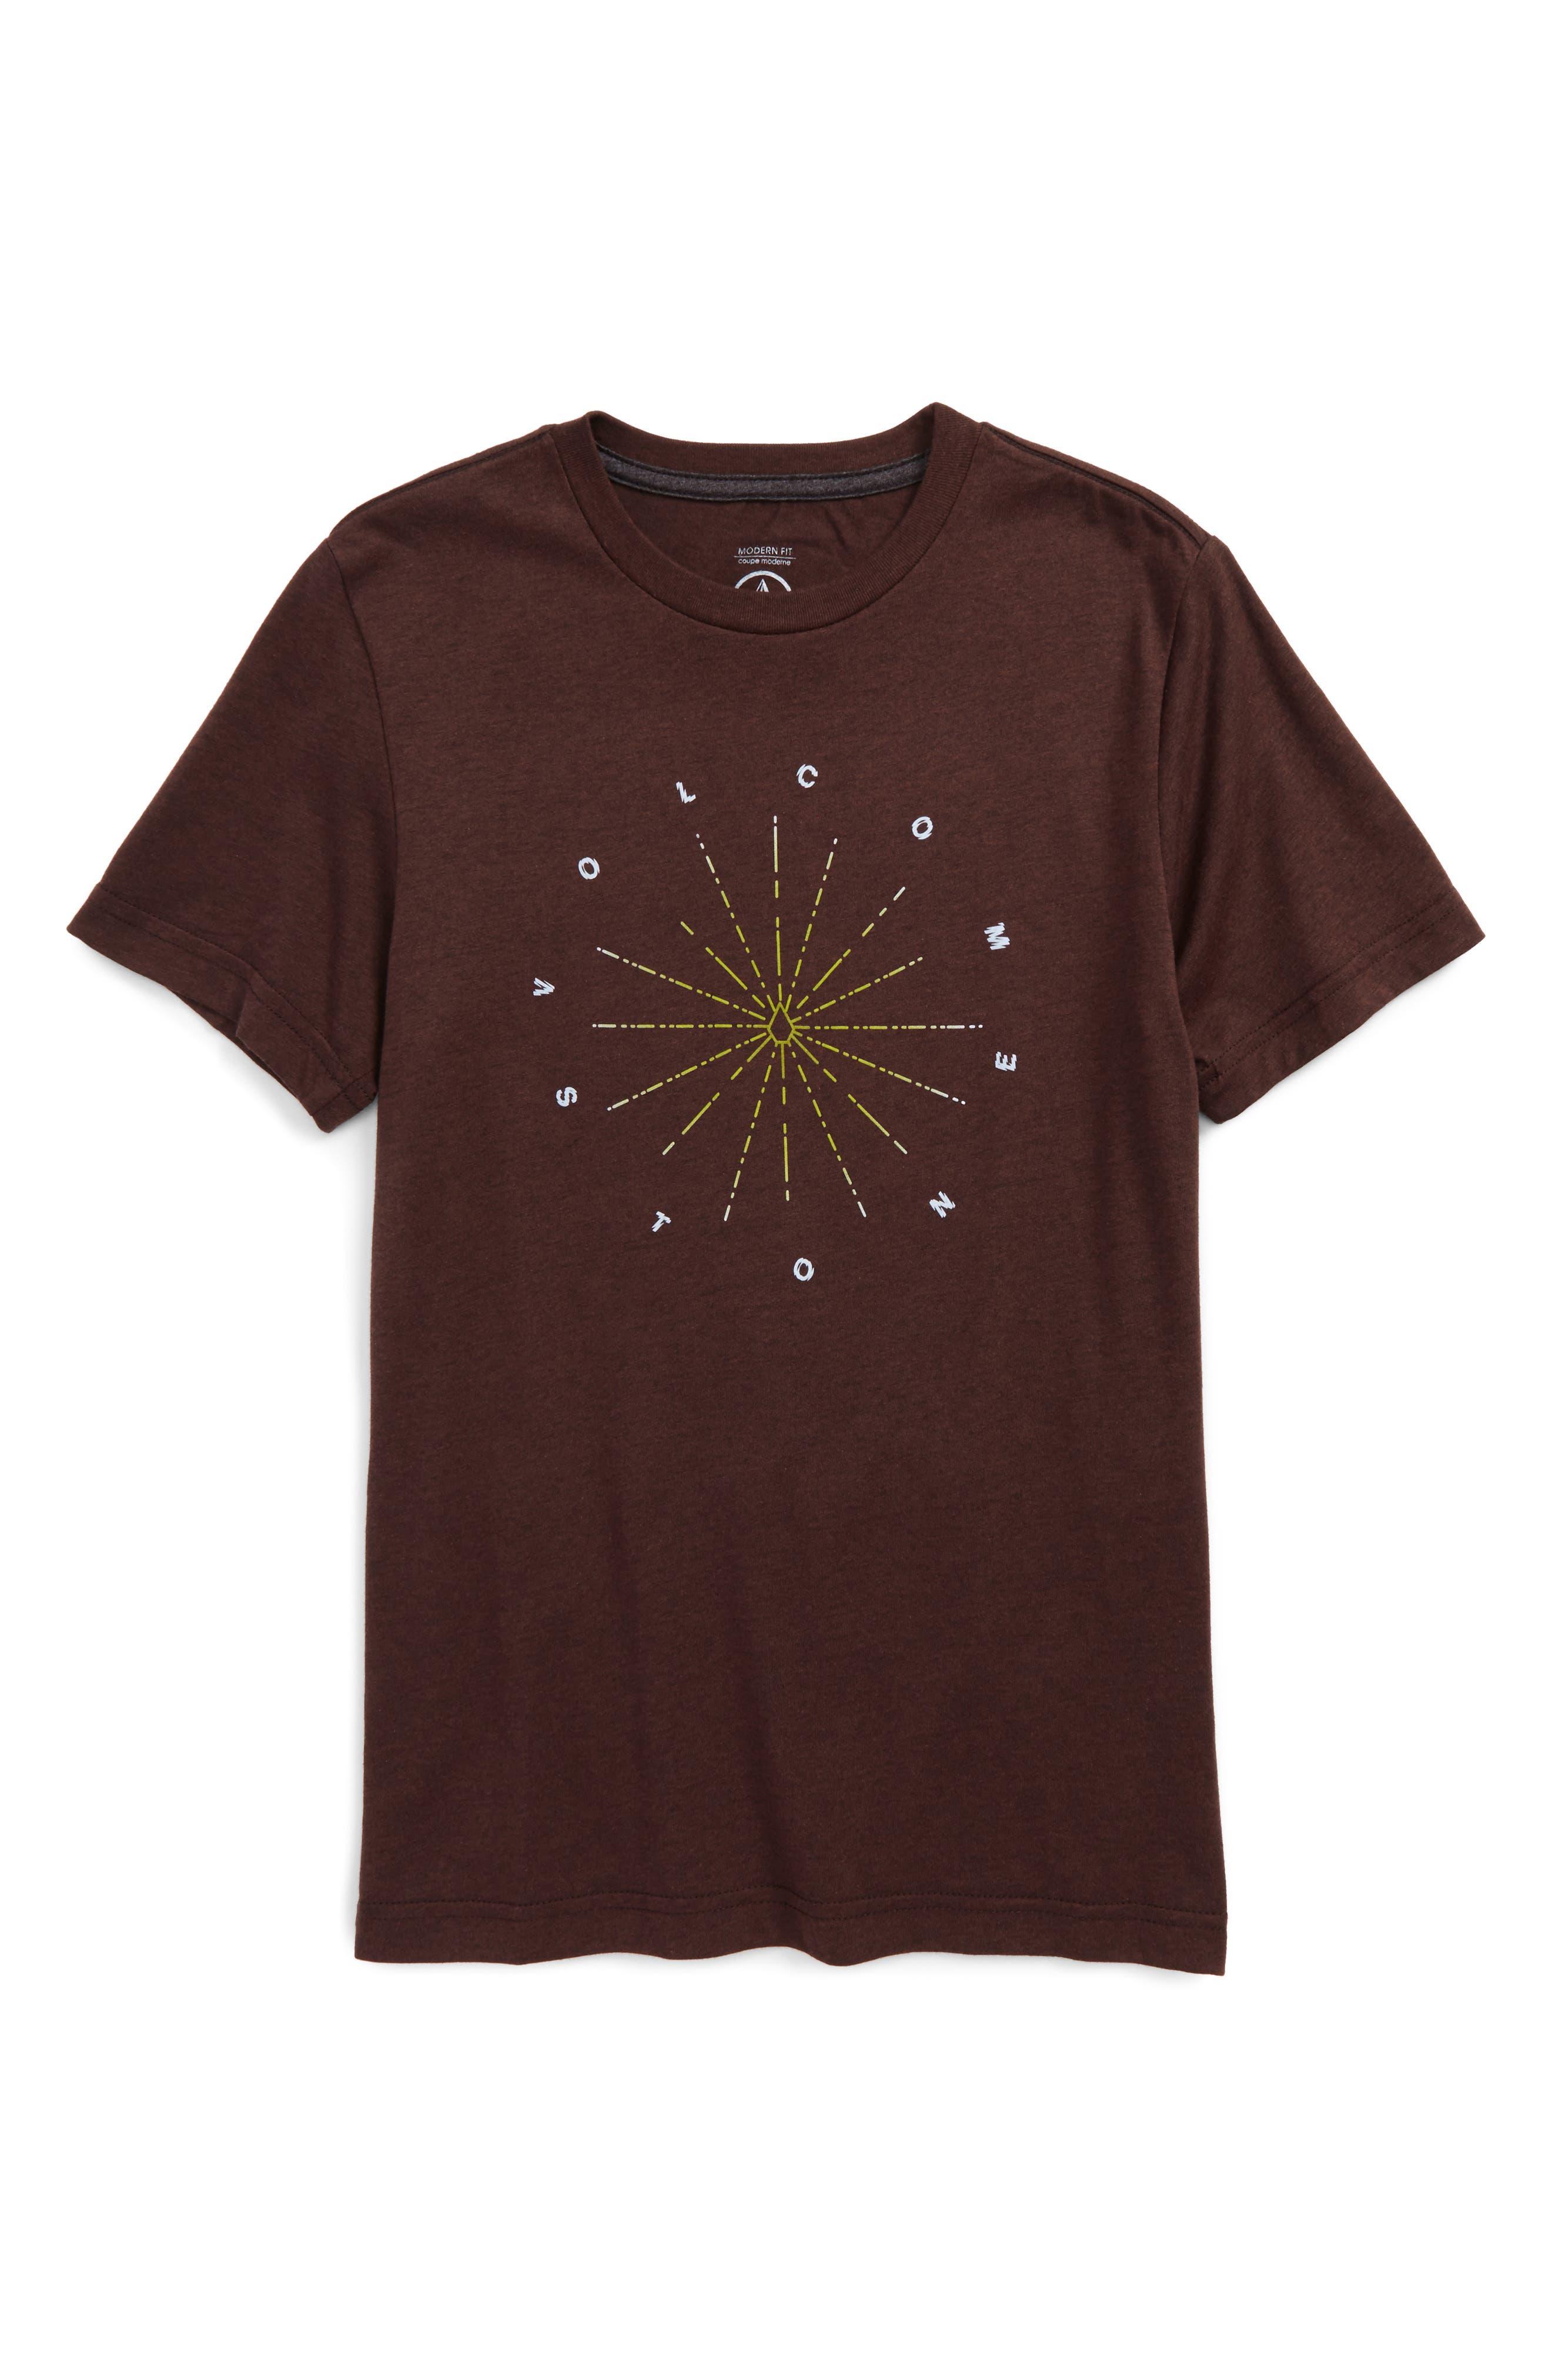 Alternate Image 1 Selected - Volcom Burst Graphic T-Shirt (Big Boys)